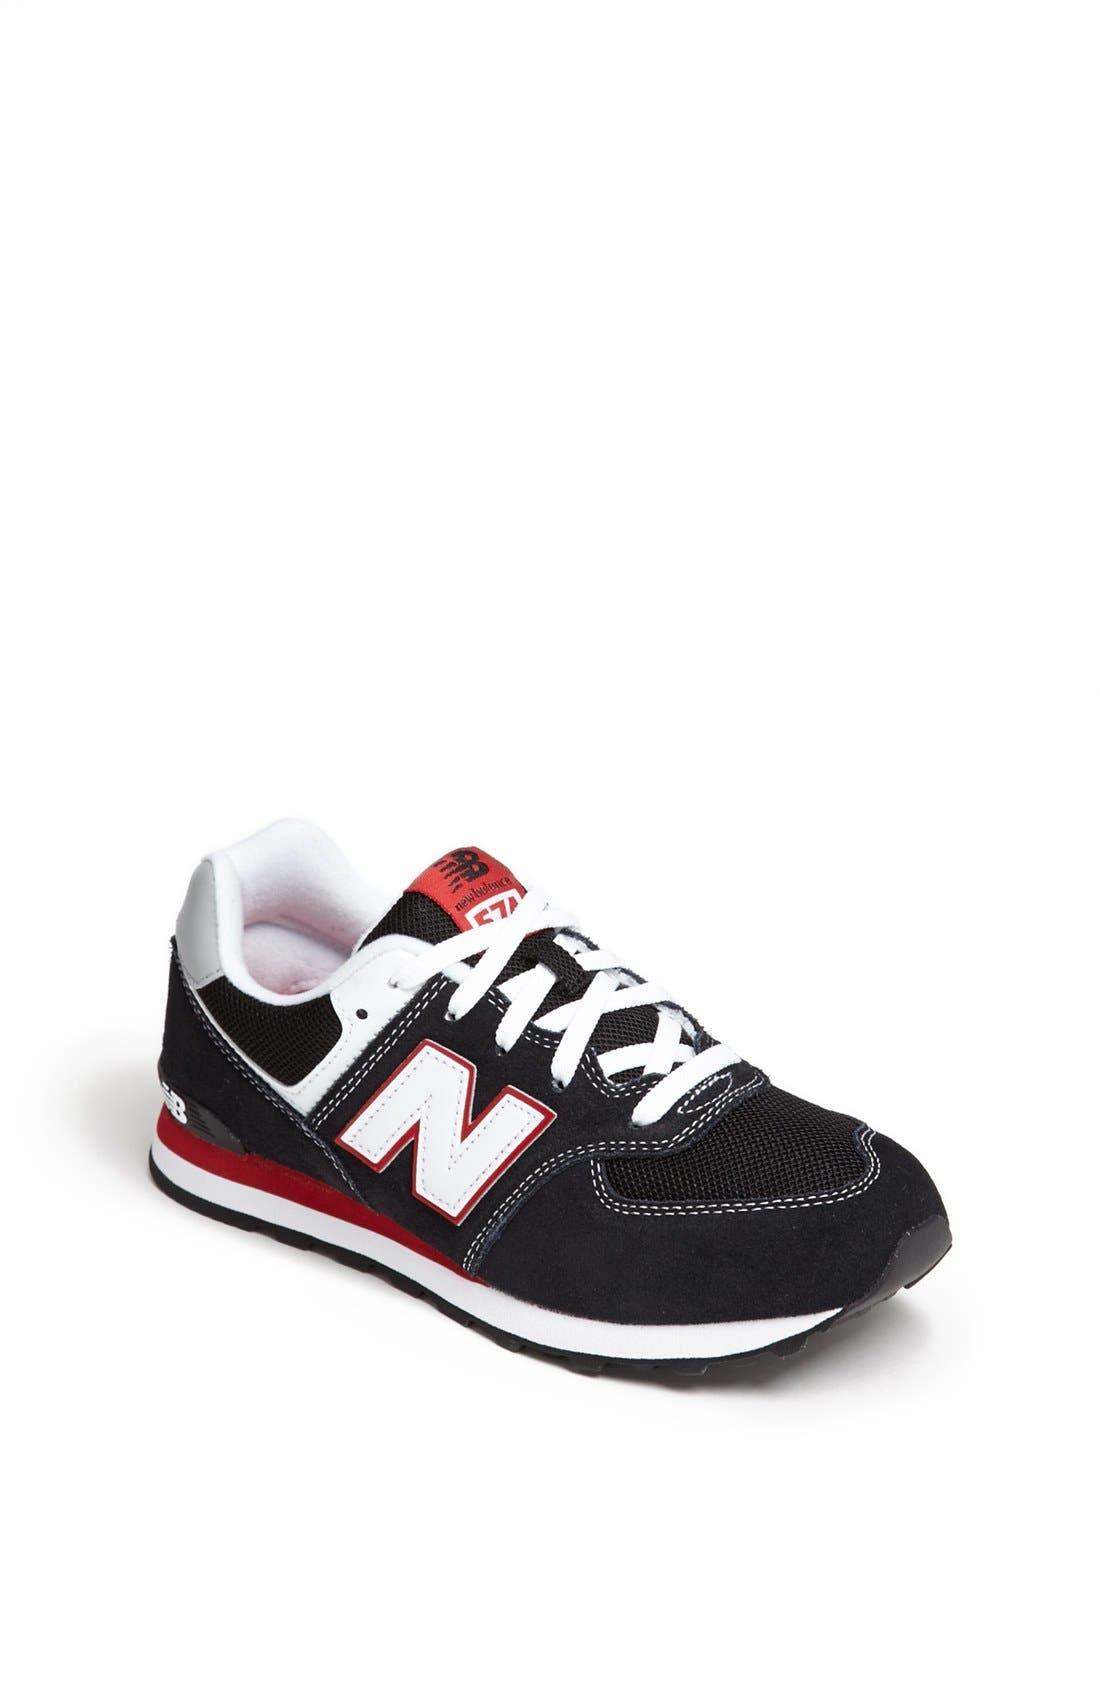 Alternate Image 1 Selected - New Balance '574 Classic' Sneaker (Baby, Walker, Toddler, Little Kid & Big Kid)